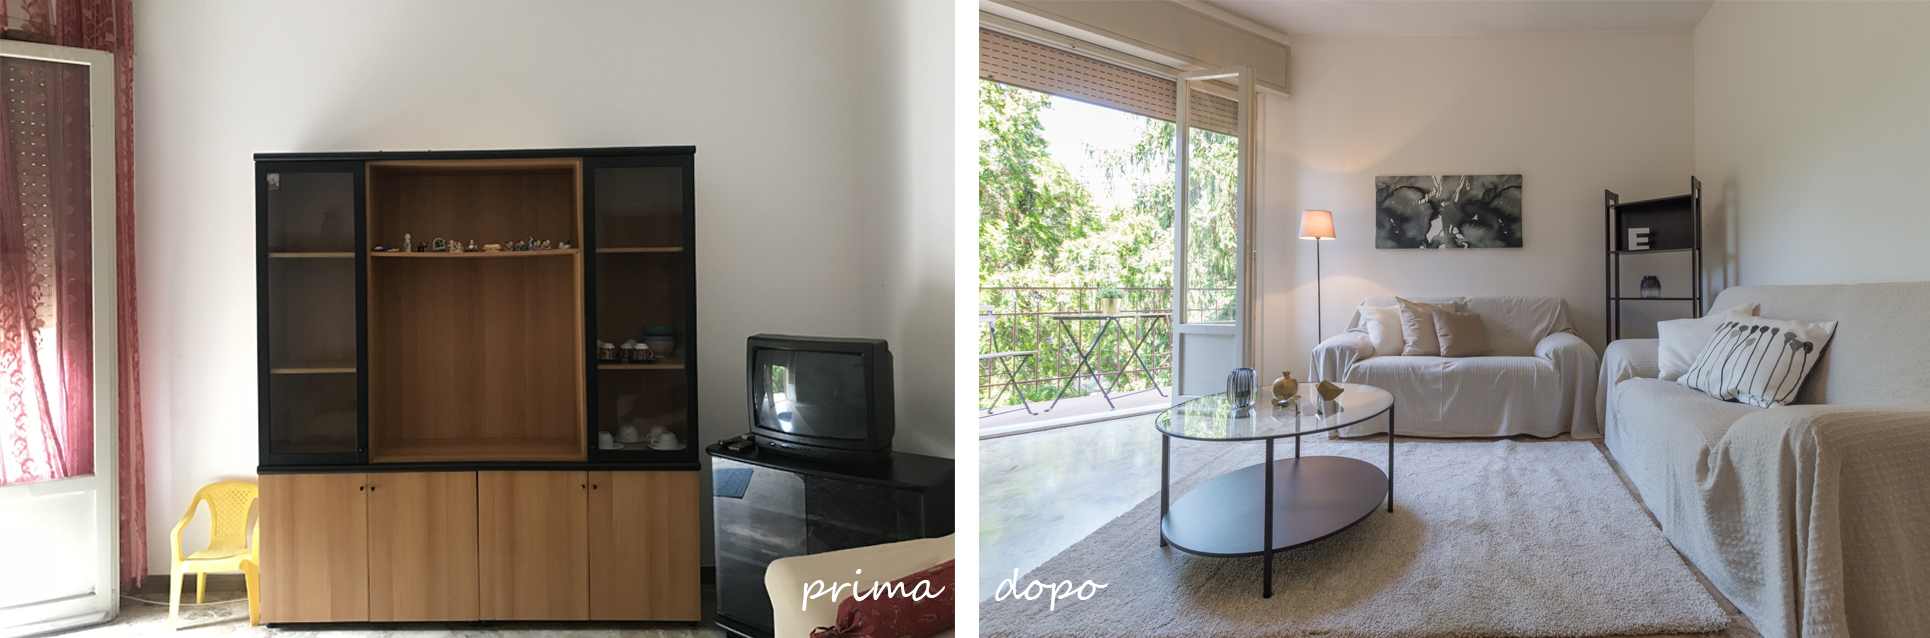 home staging forlì, homestaging, vendere casa con l'home staging, affitto casa con l'home staging, allestimento home staging